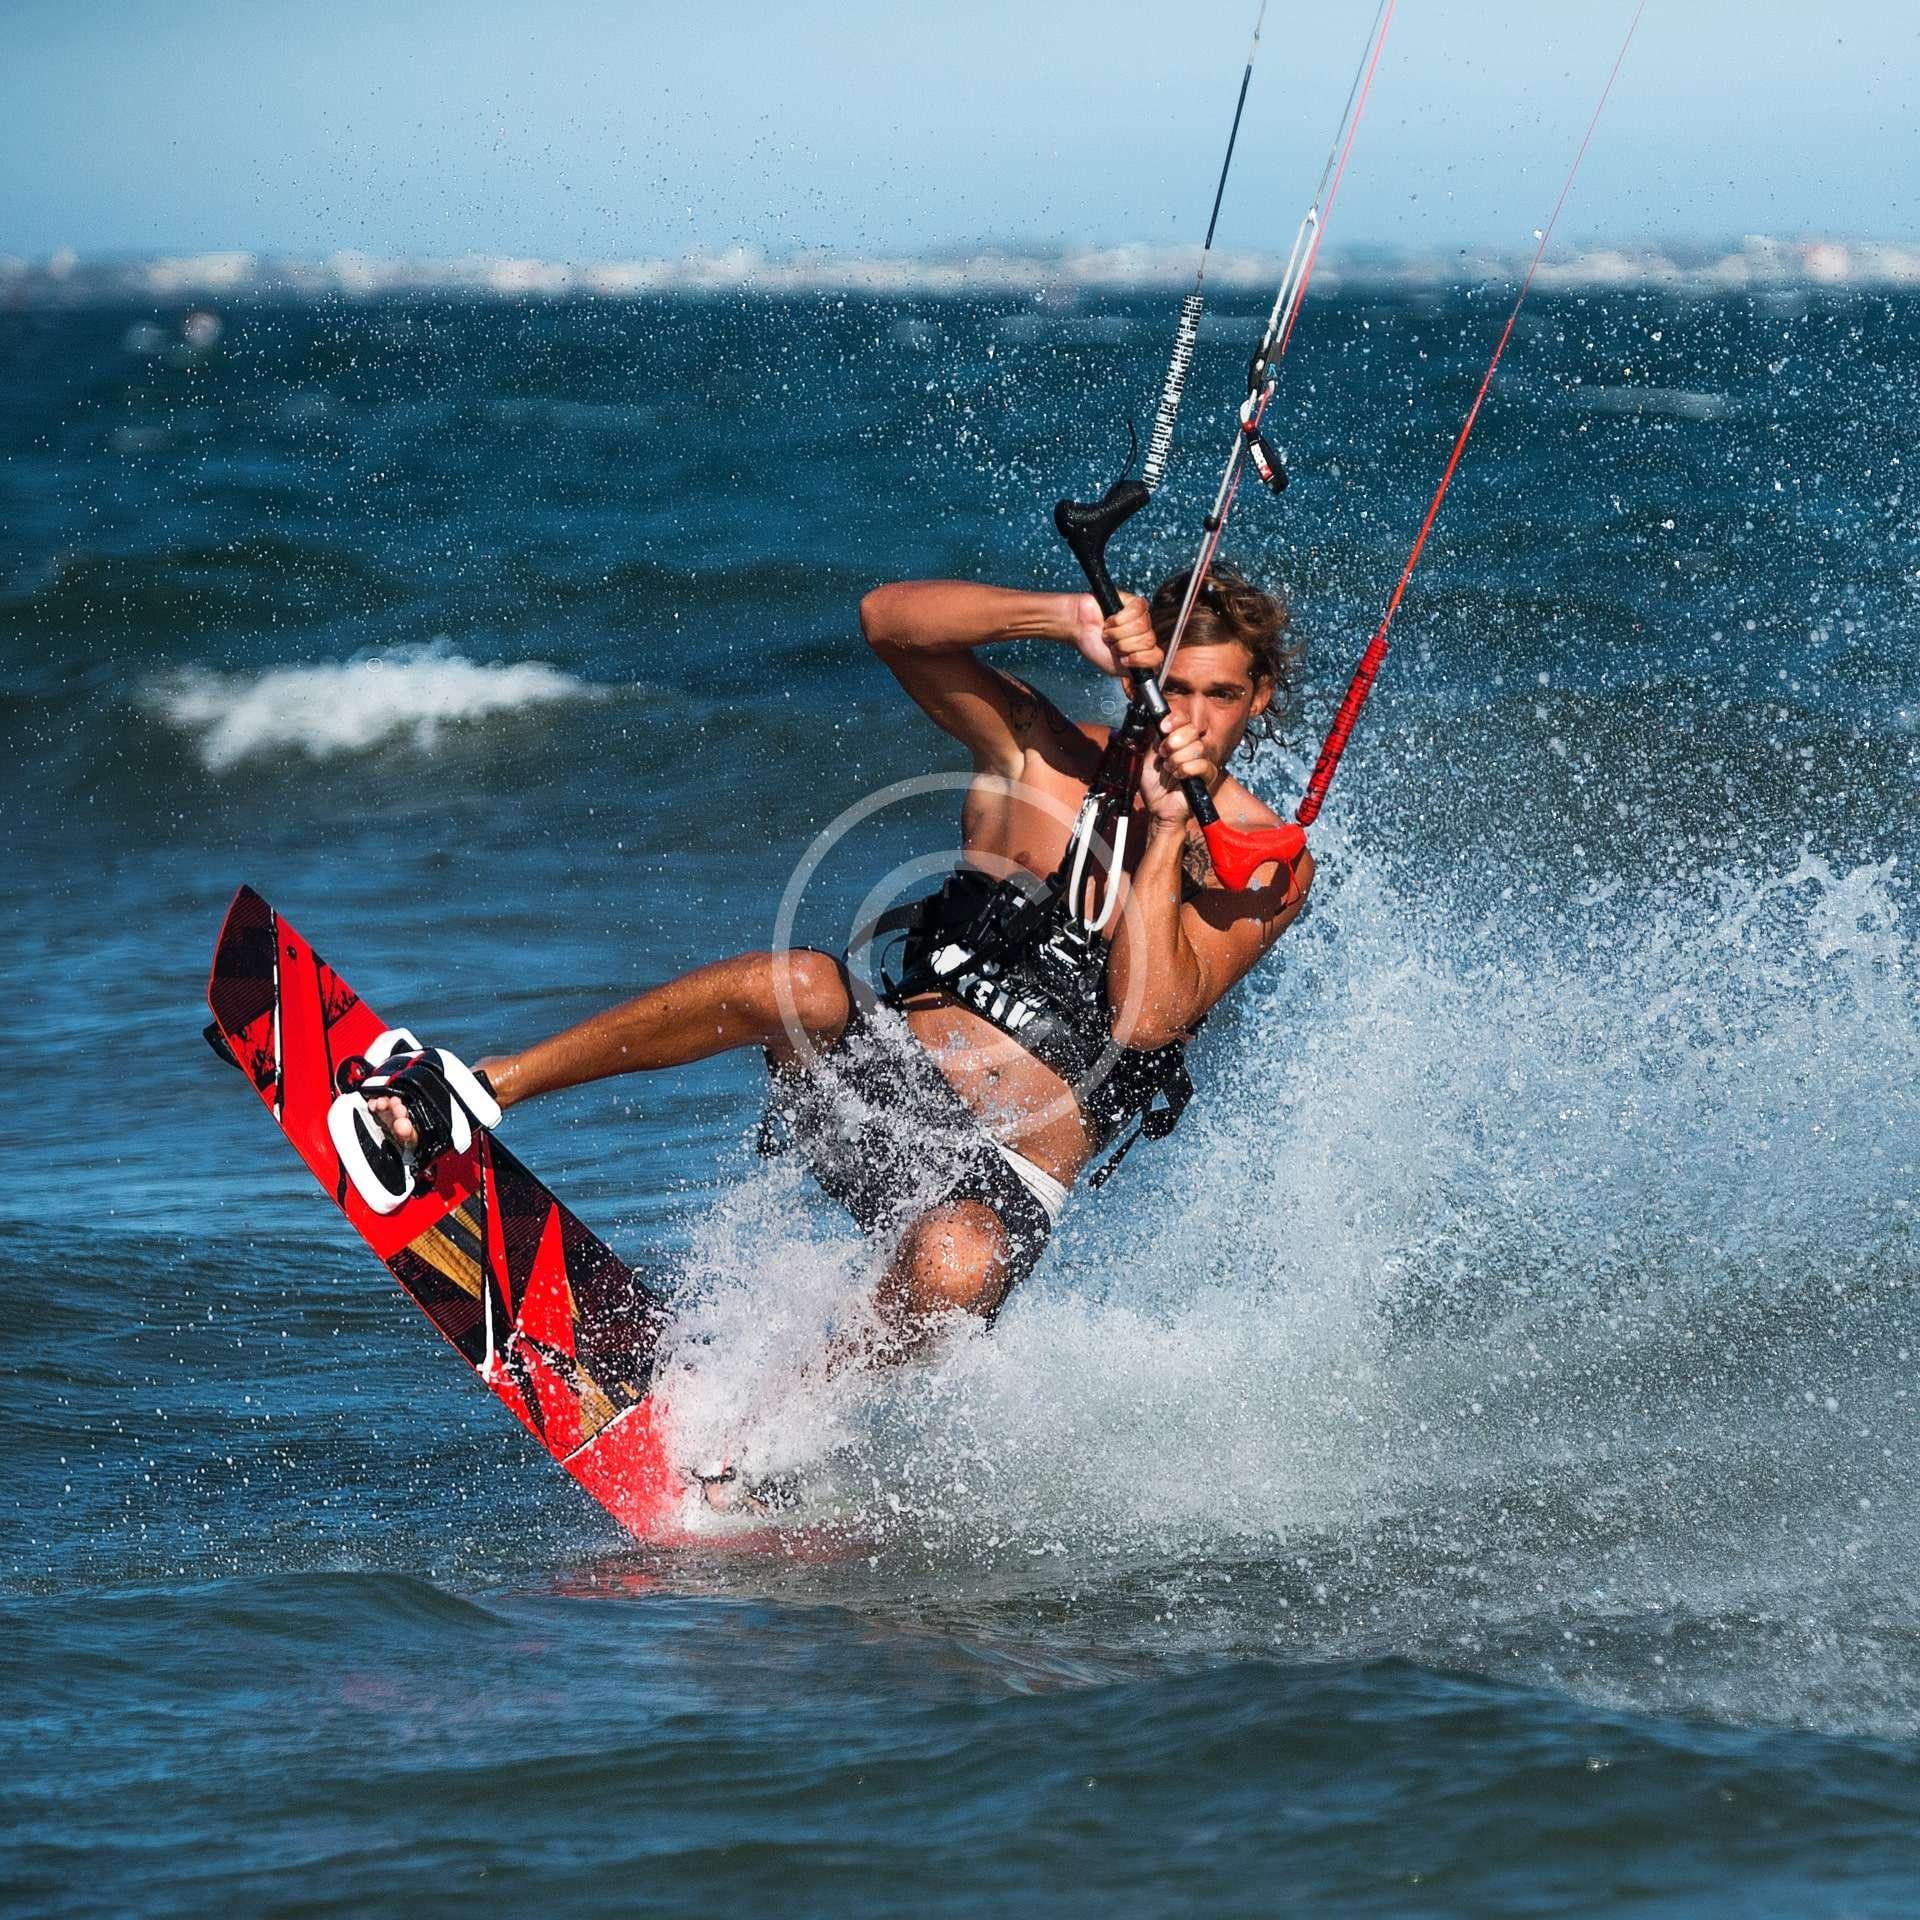 Corporate Kitesurfing